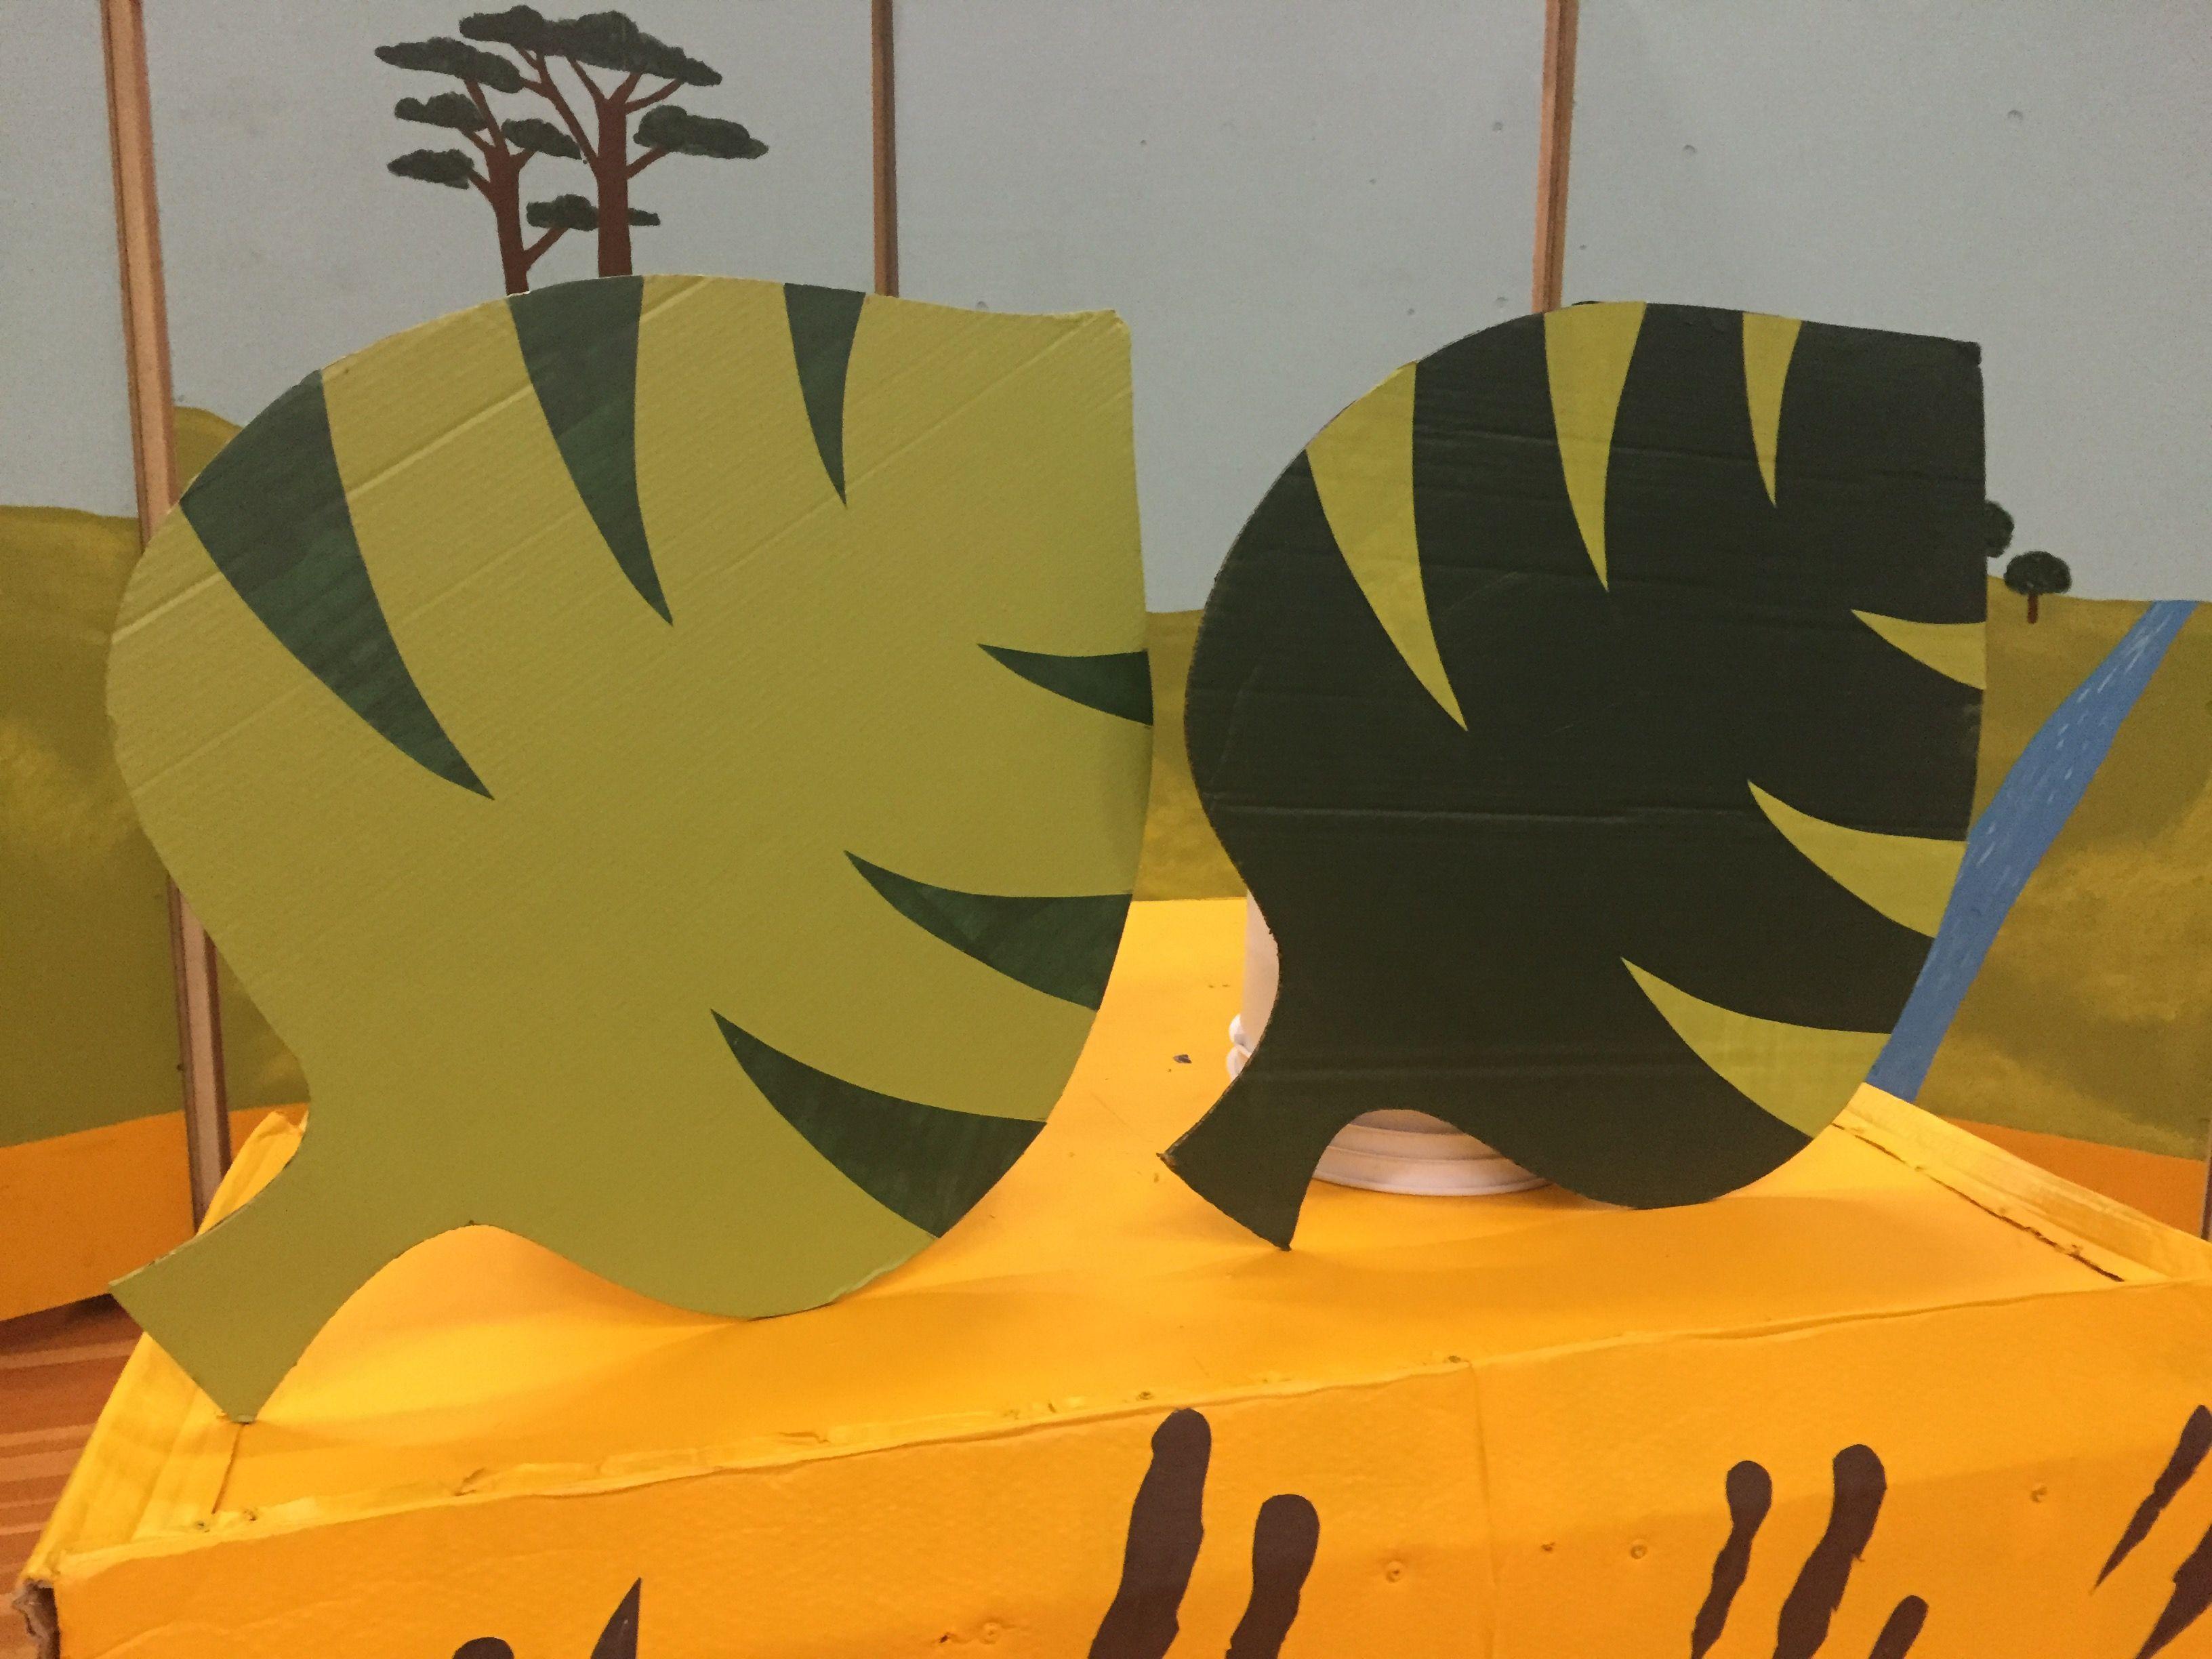 Li lion king coloring games online free - Lawrence Jones Middle School Lion King Jr Jungle Leaves